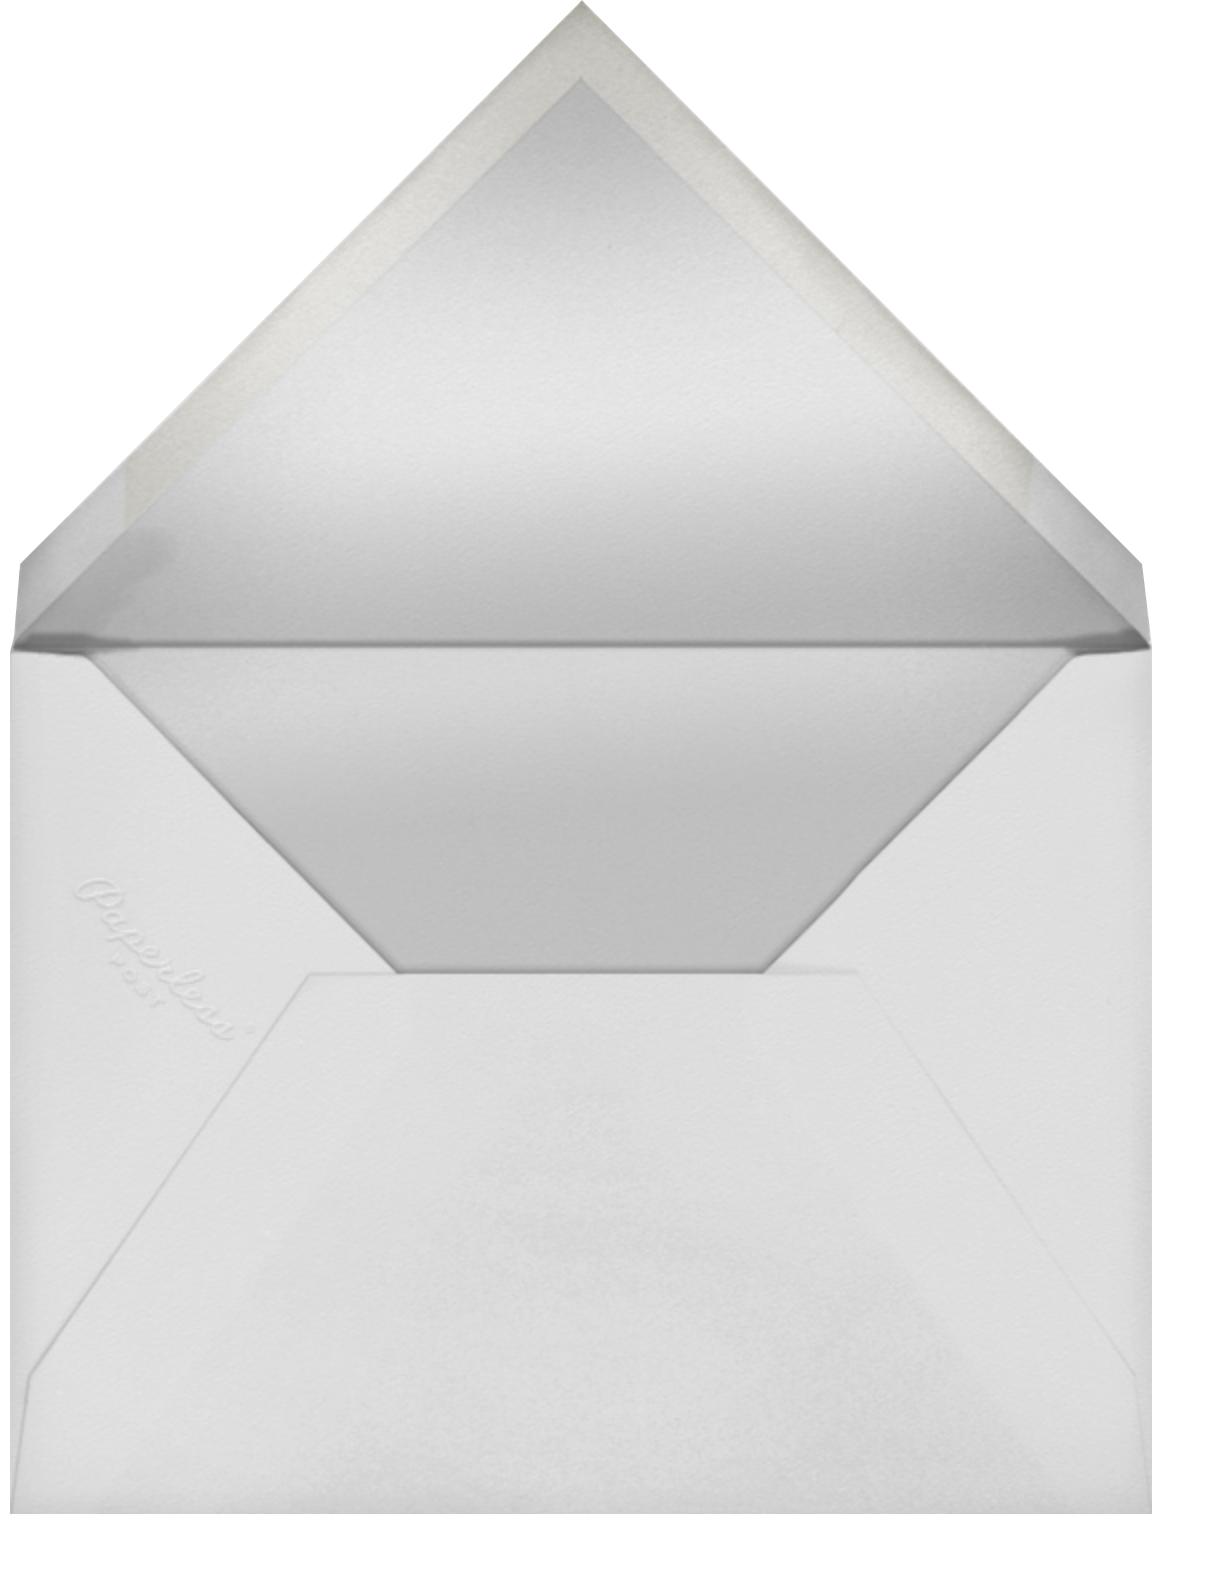 Ice Cream Sundae (Sweet Pea) - Paperless Post - Kids' birthday - envelope back